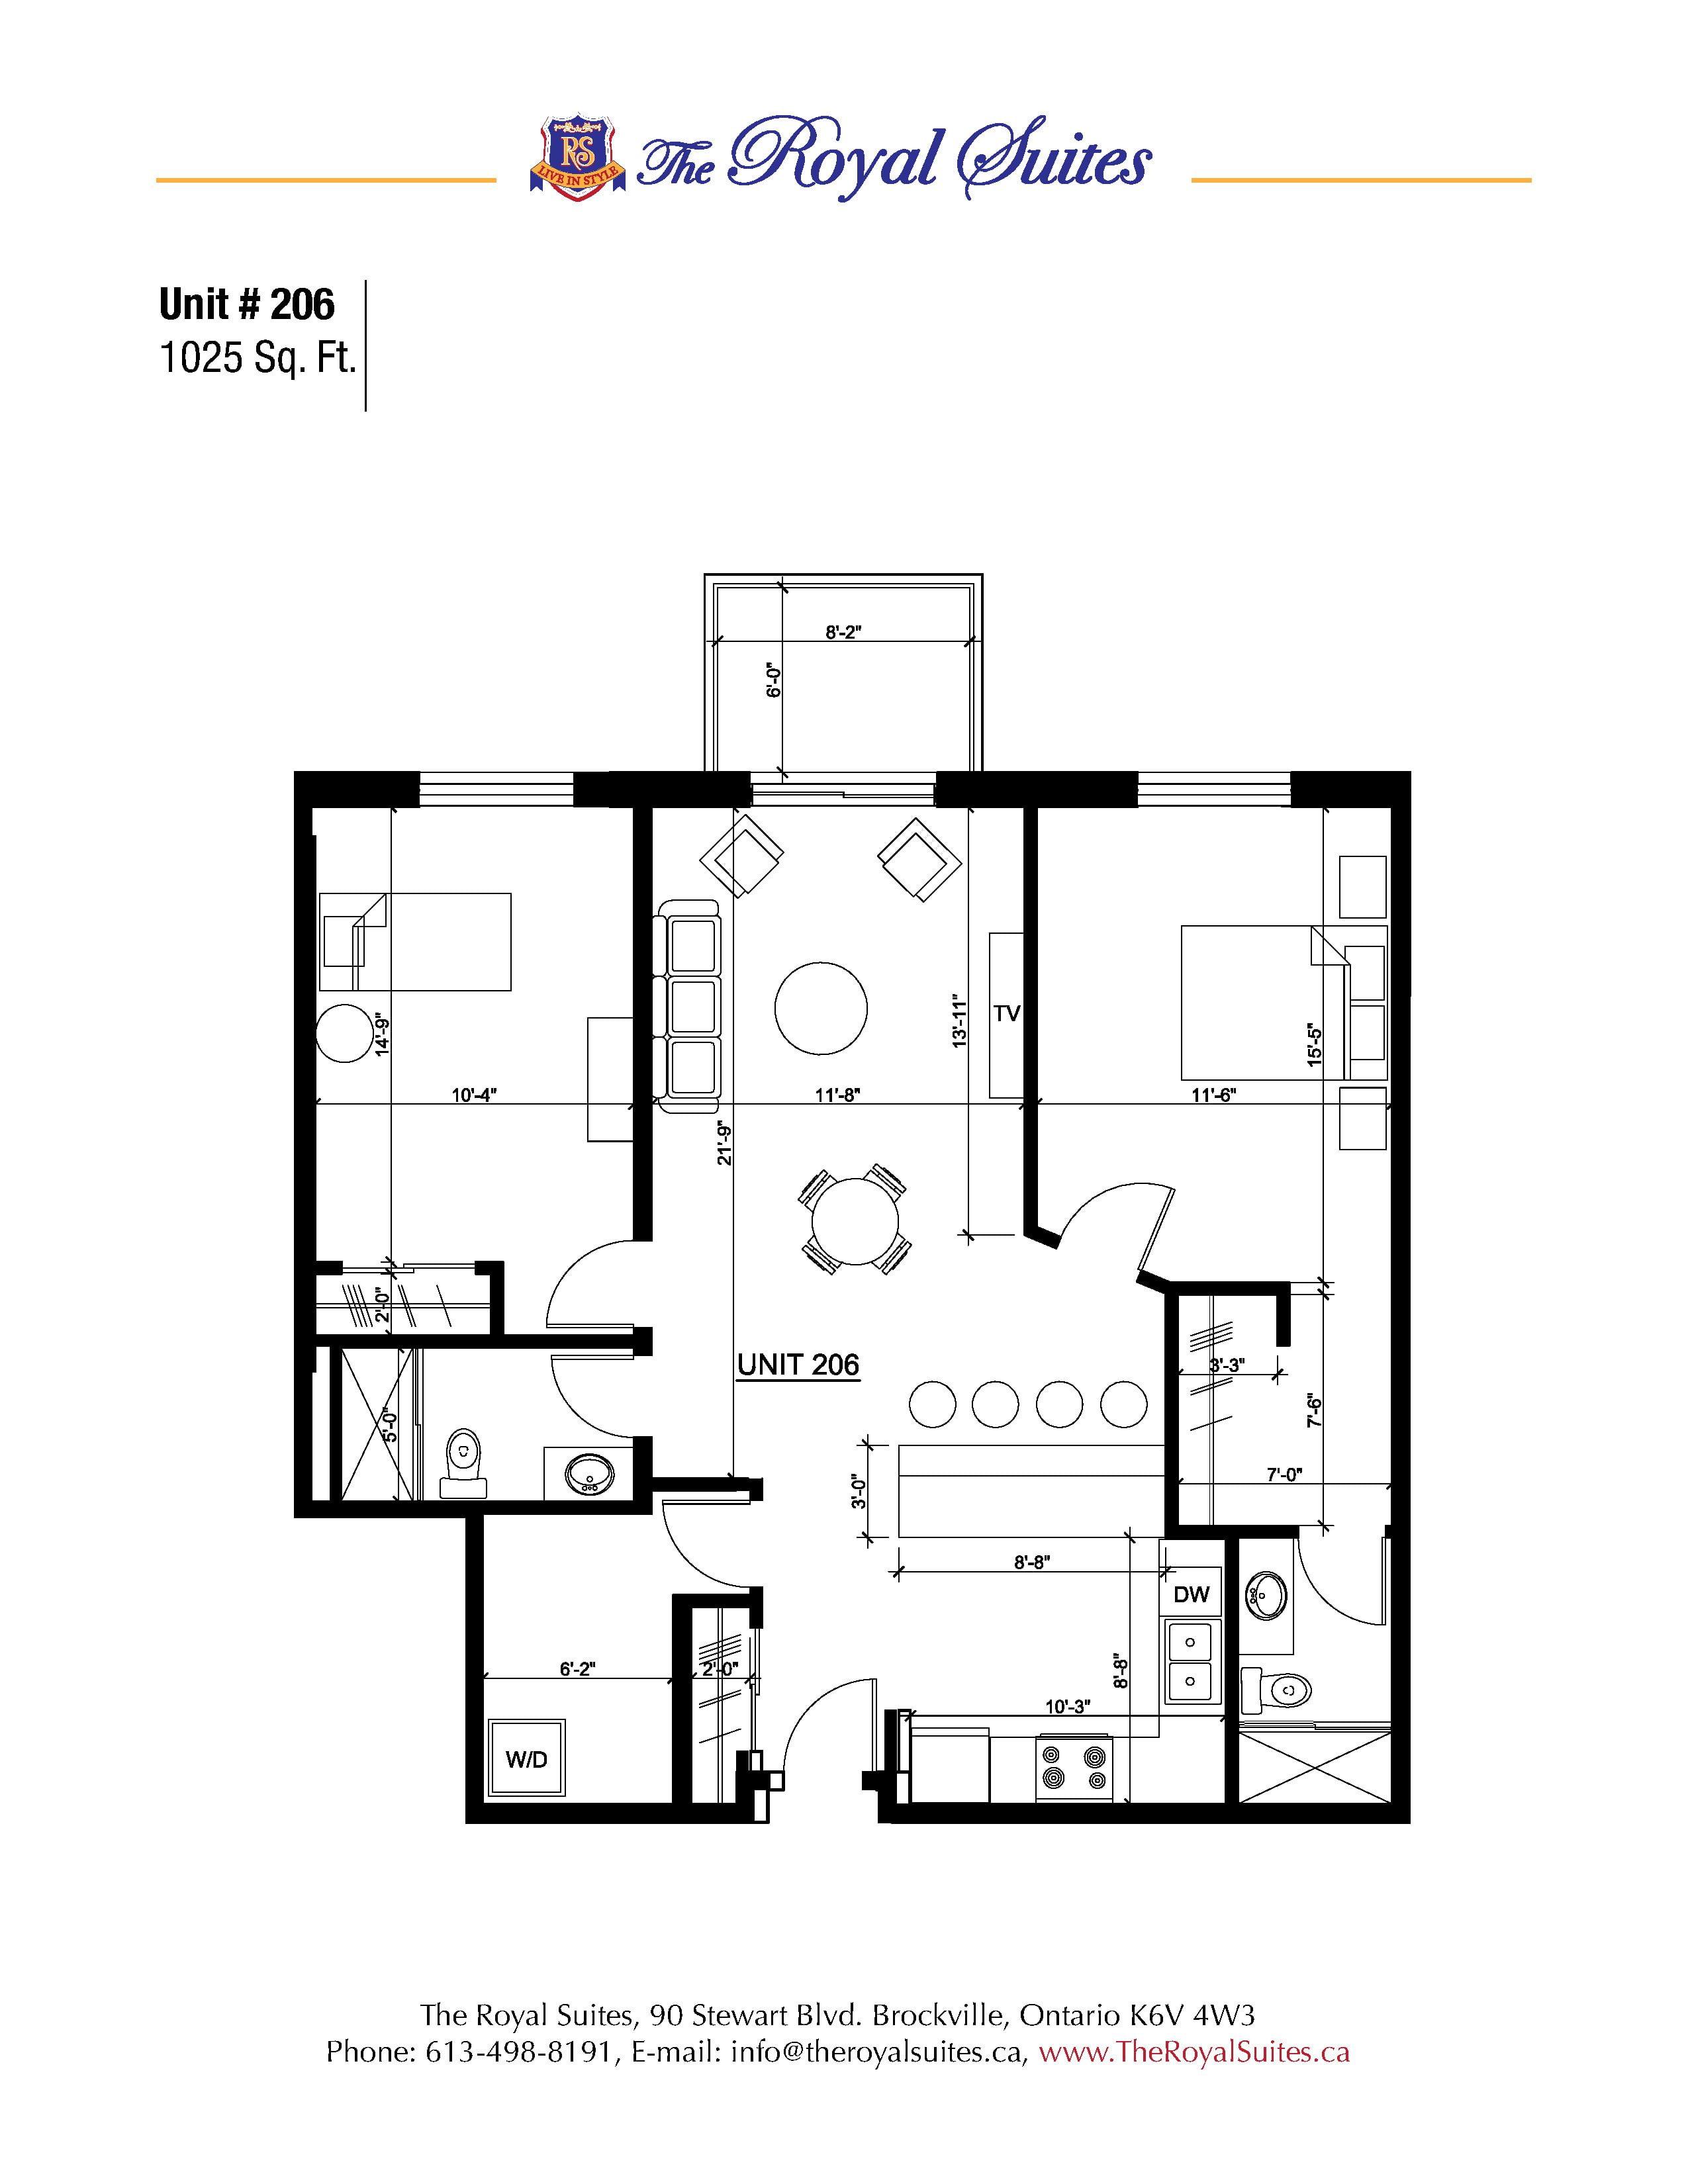 8 Floor Plans Lowres_1_3